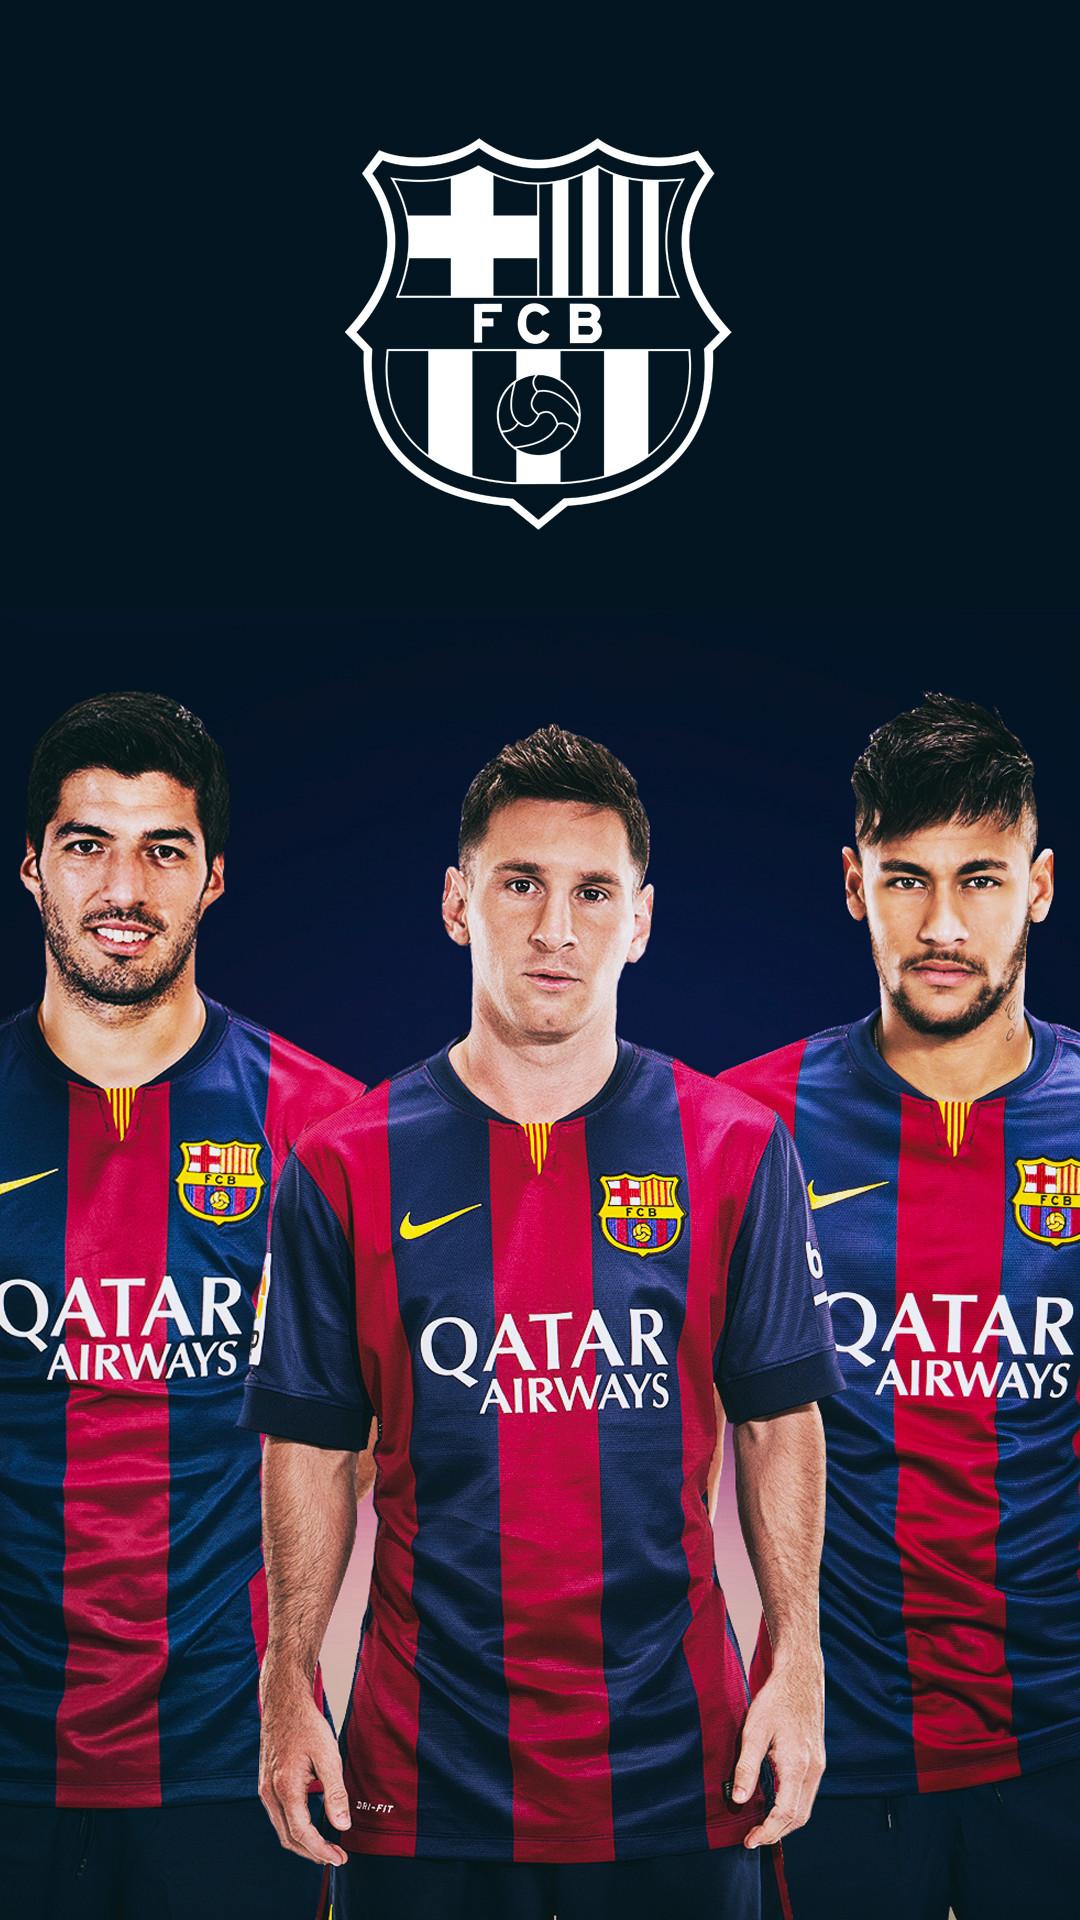 … FC Barcelona phone wallpaper HD by SelvedinFCB